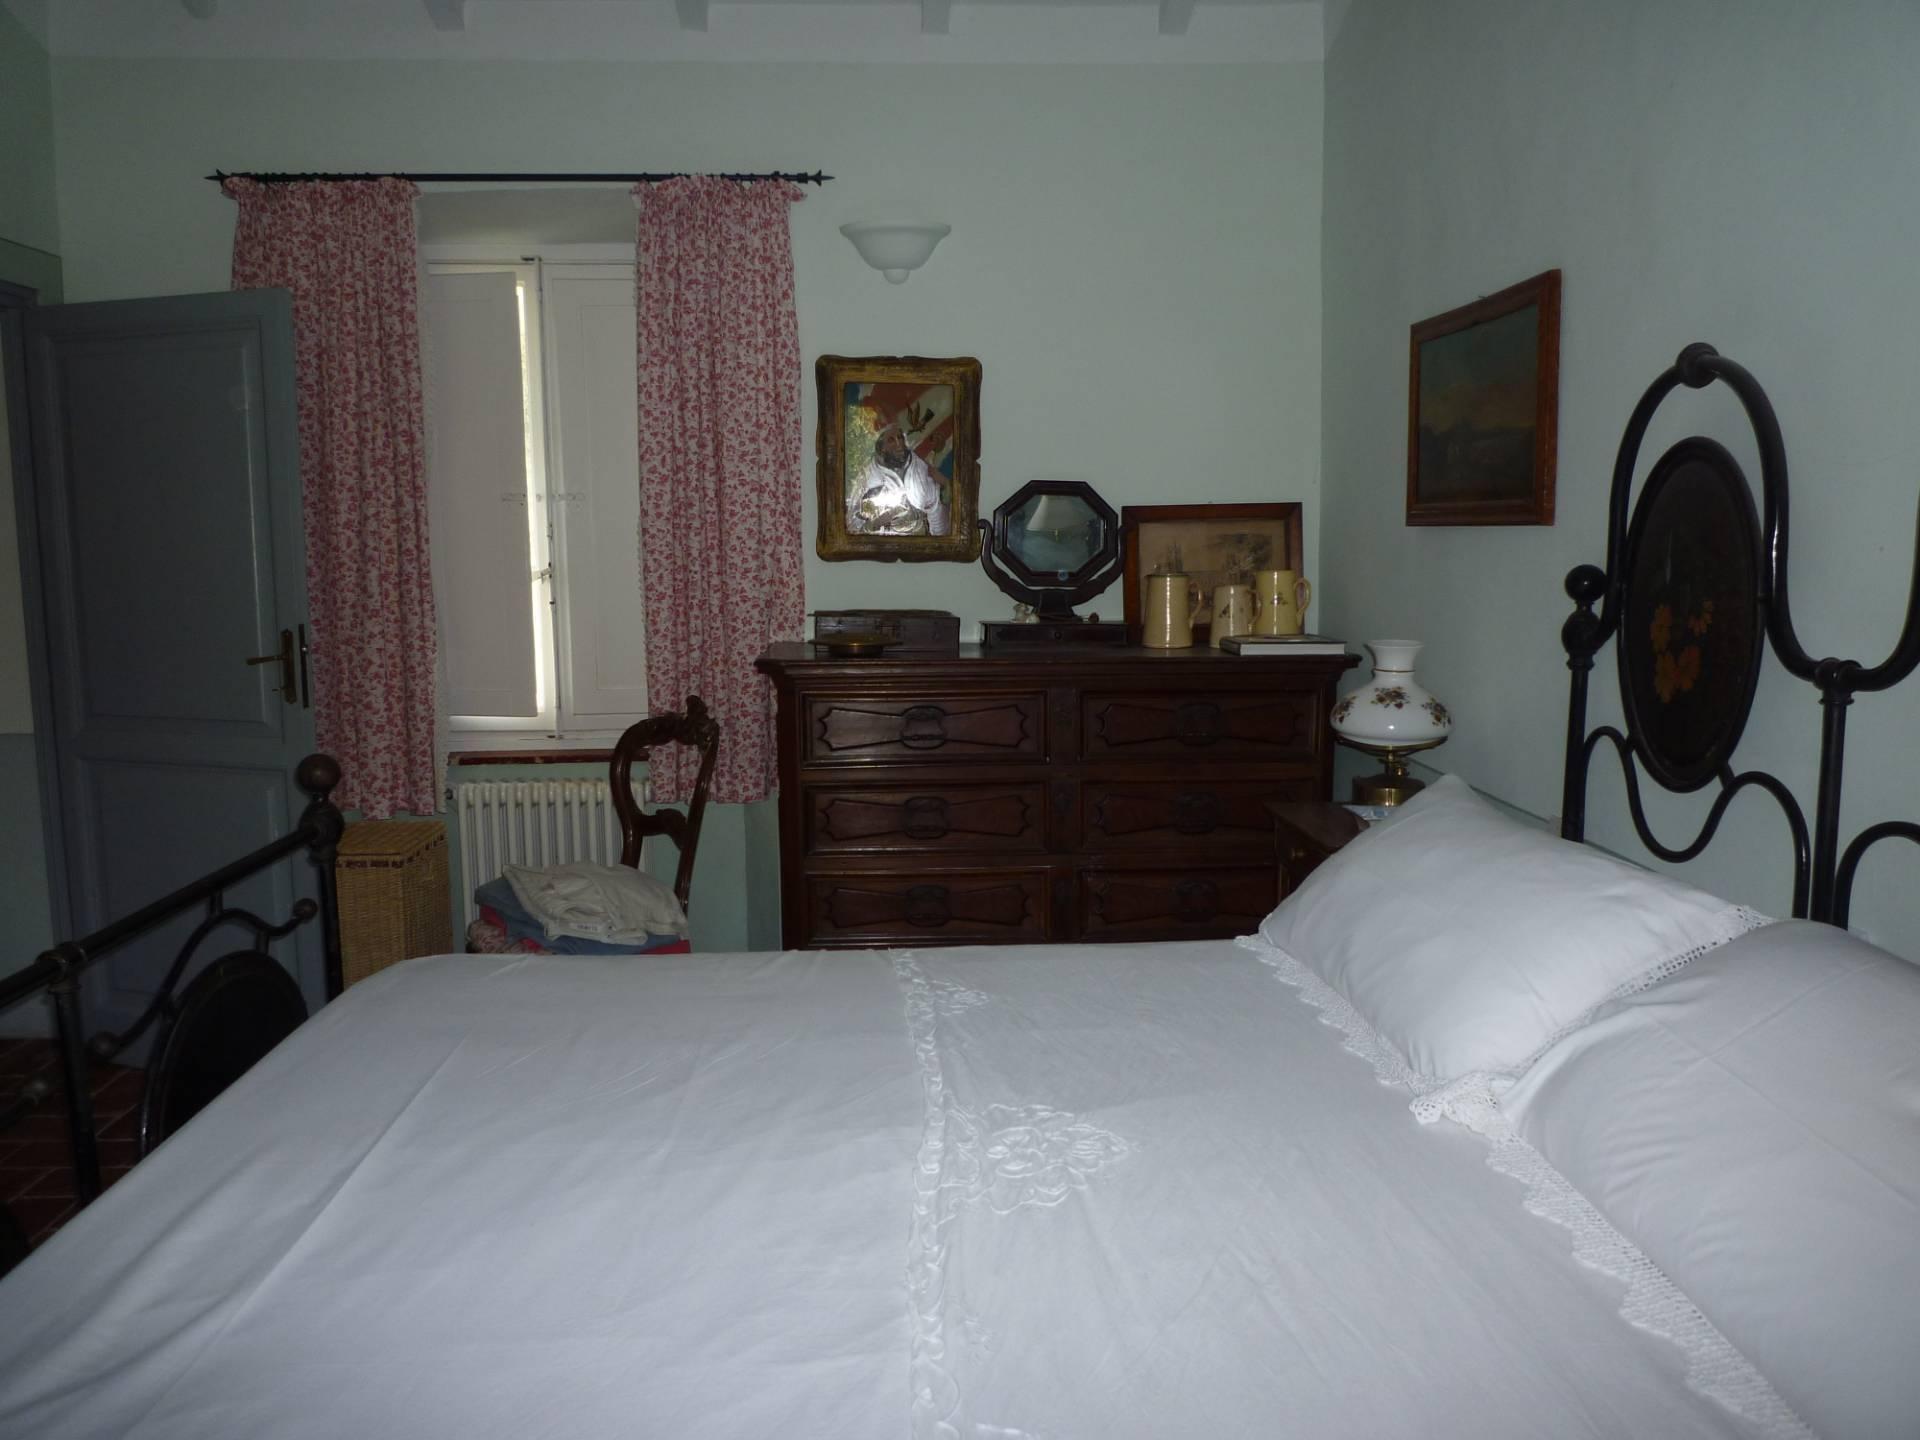 Villa in Vendita a Camaiore: 5 locali, 120 mq - Foto 28